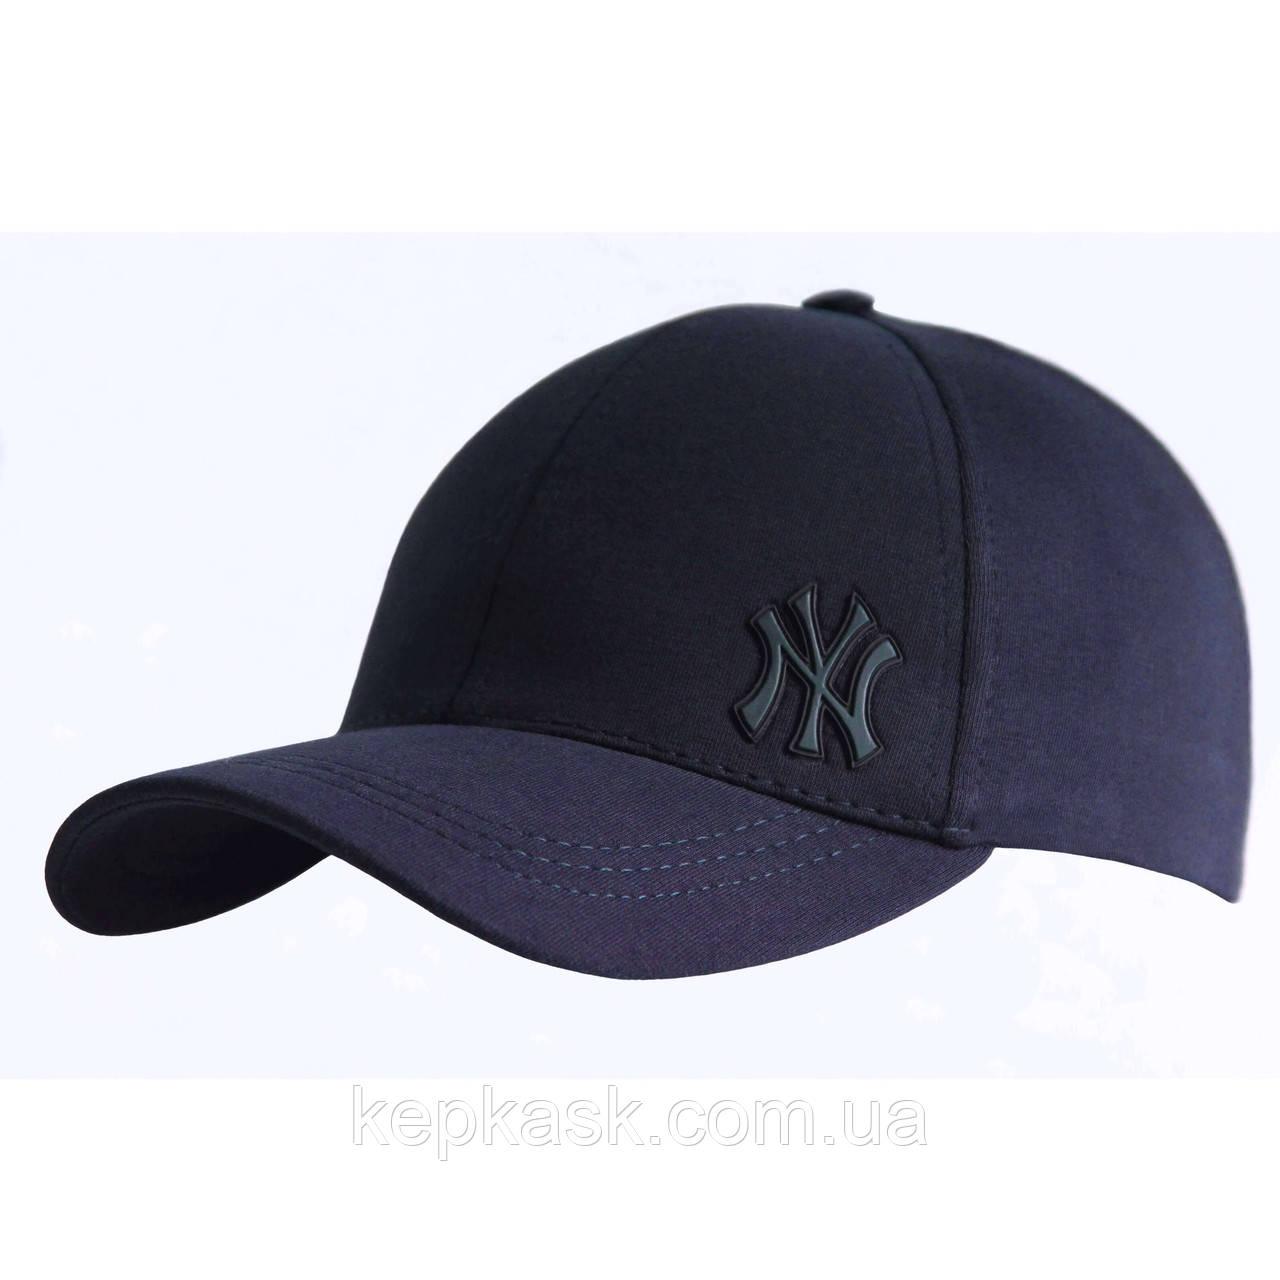 Бейсболка трикотаж NY